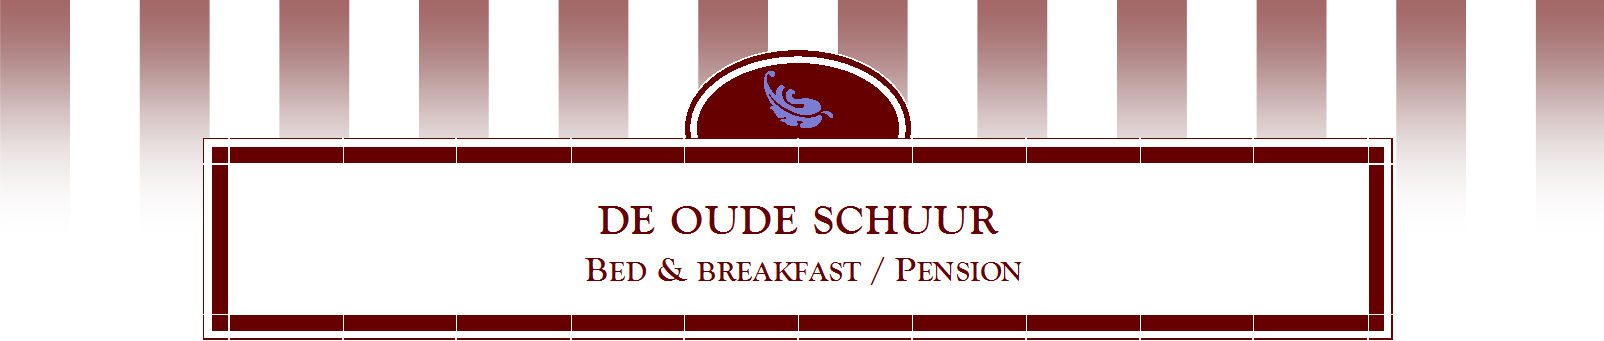 Bed and Breakfast-Pension Arnhem Nijmegen